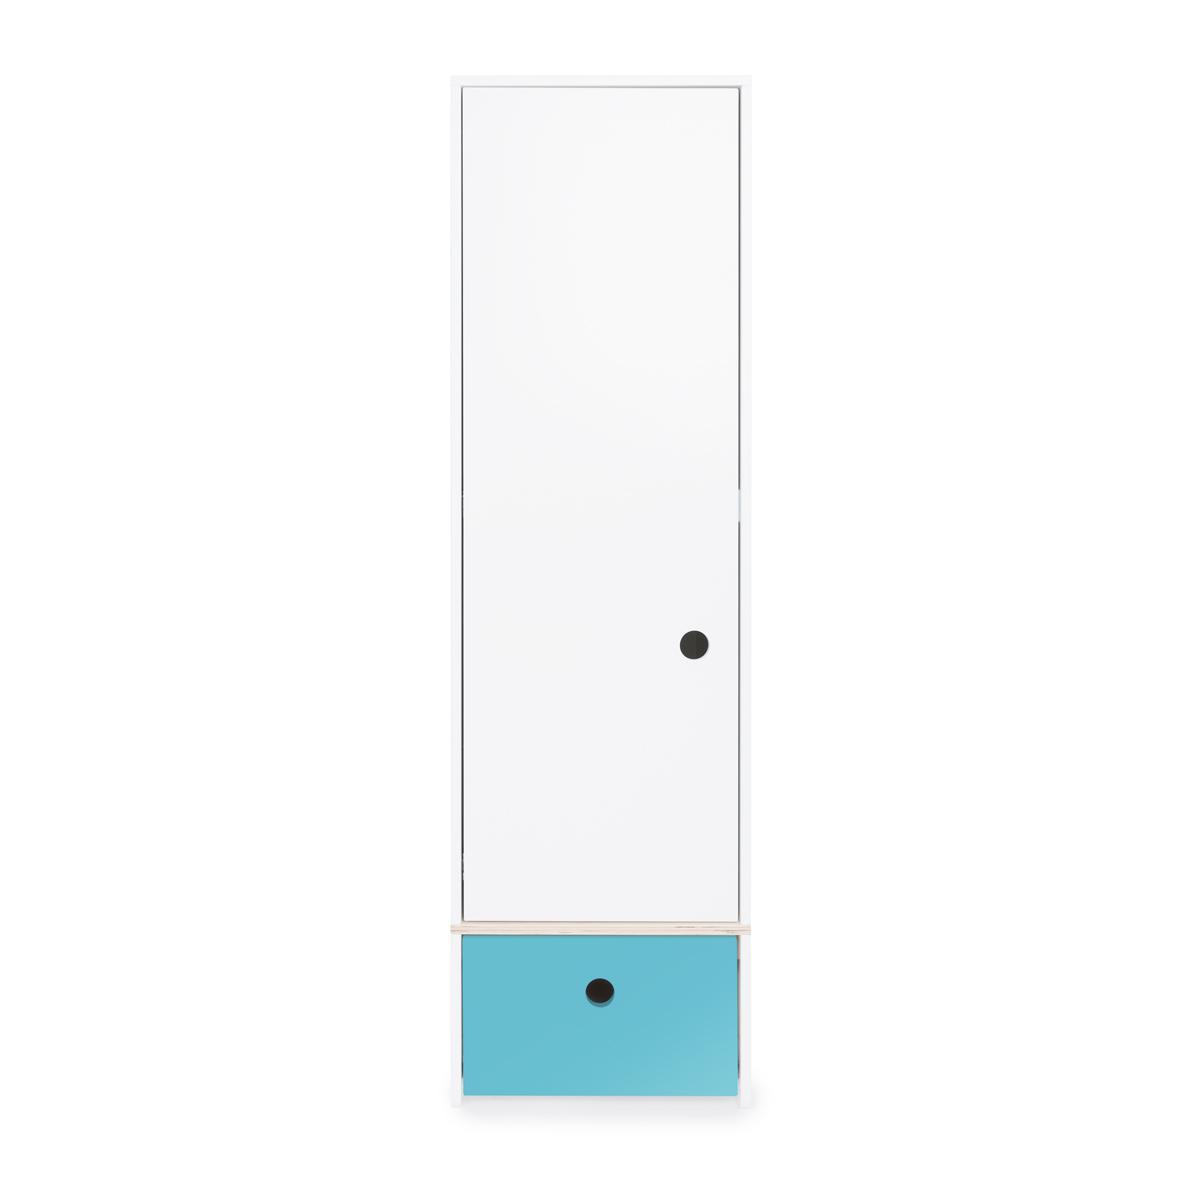 Armario 1 puerta COLORFLEX cajón frontal paradise blue